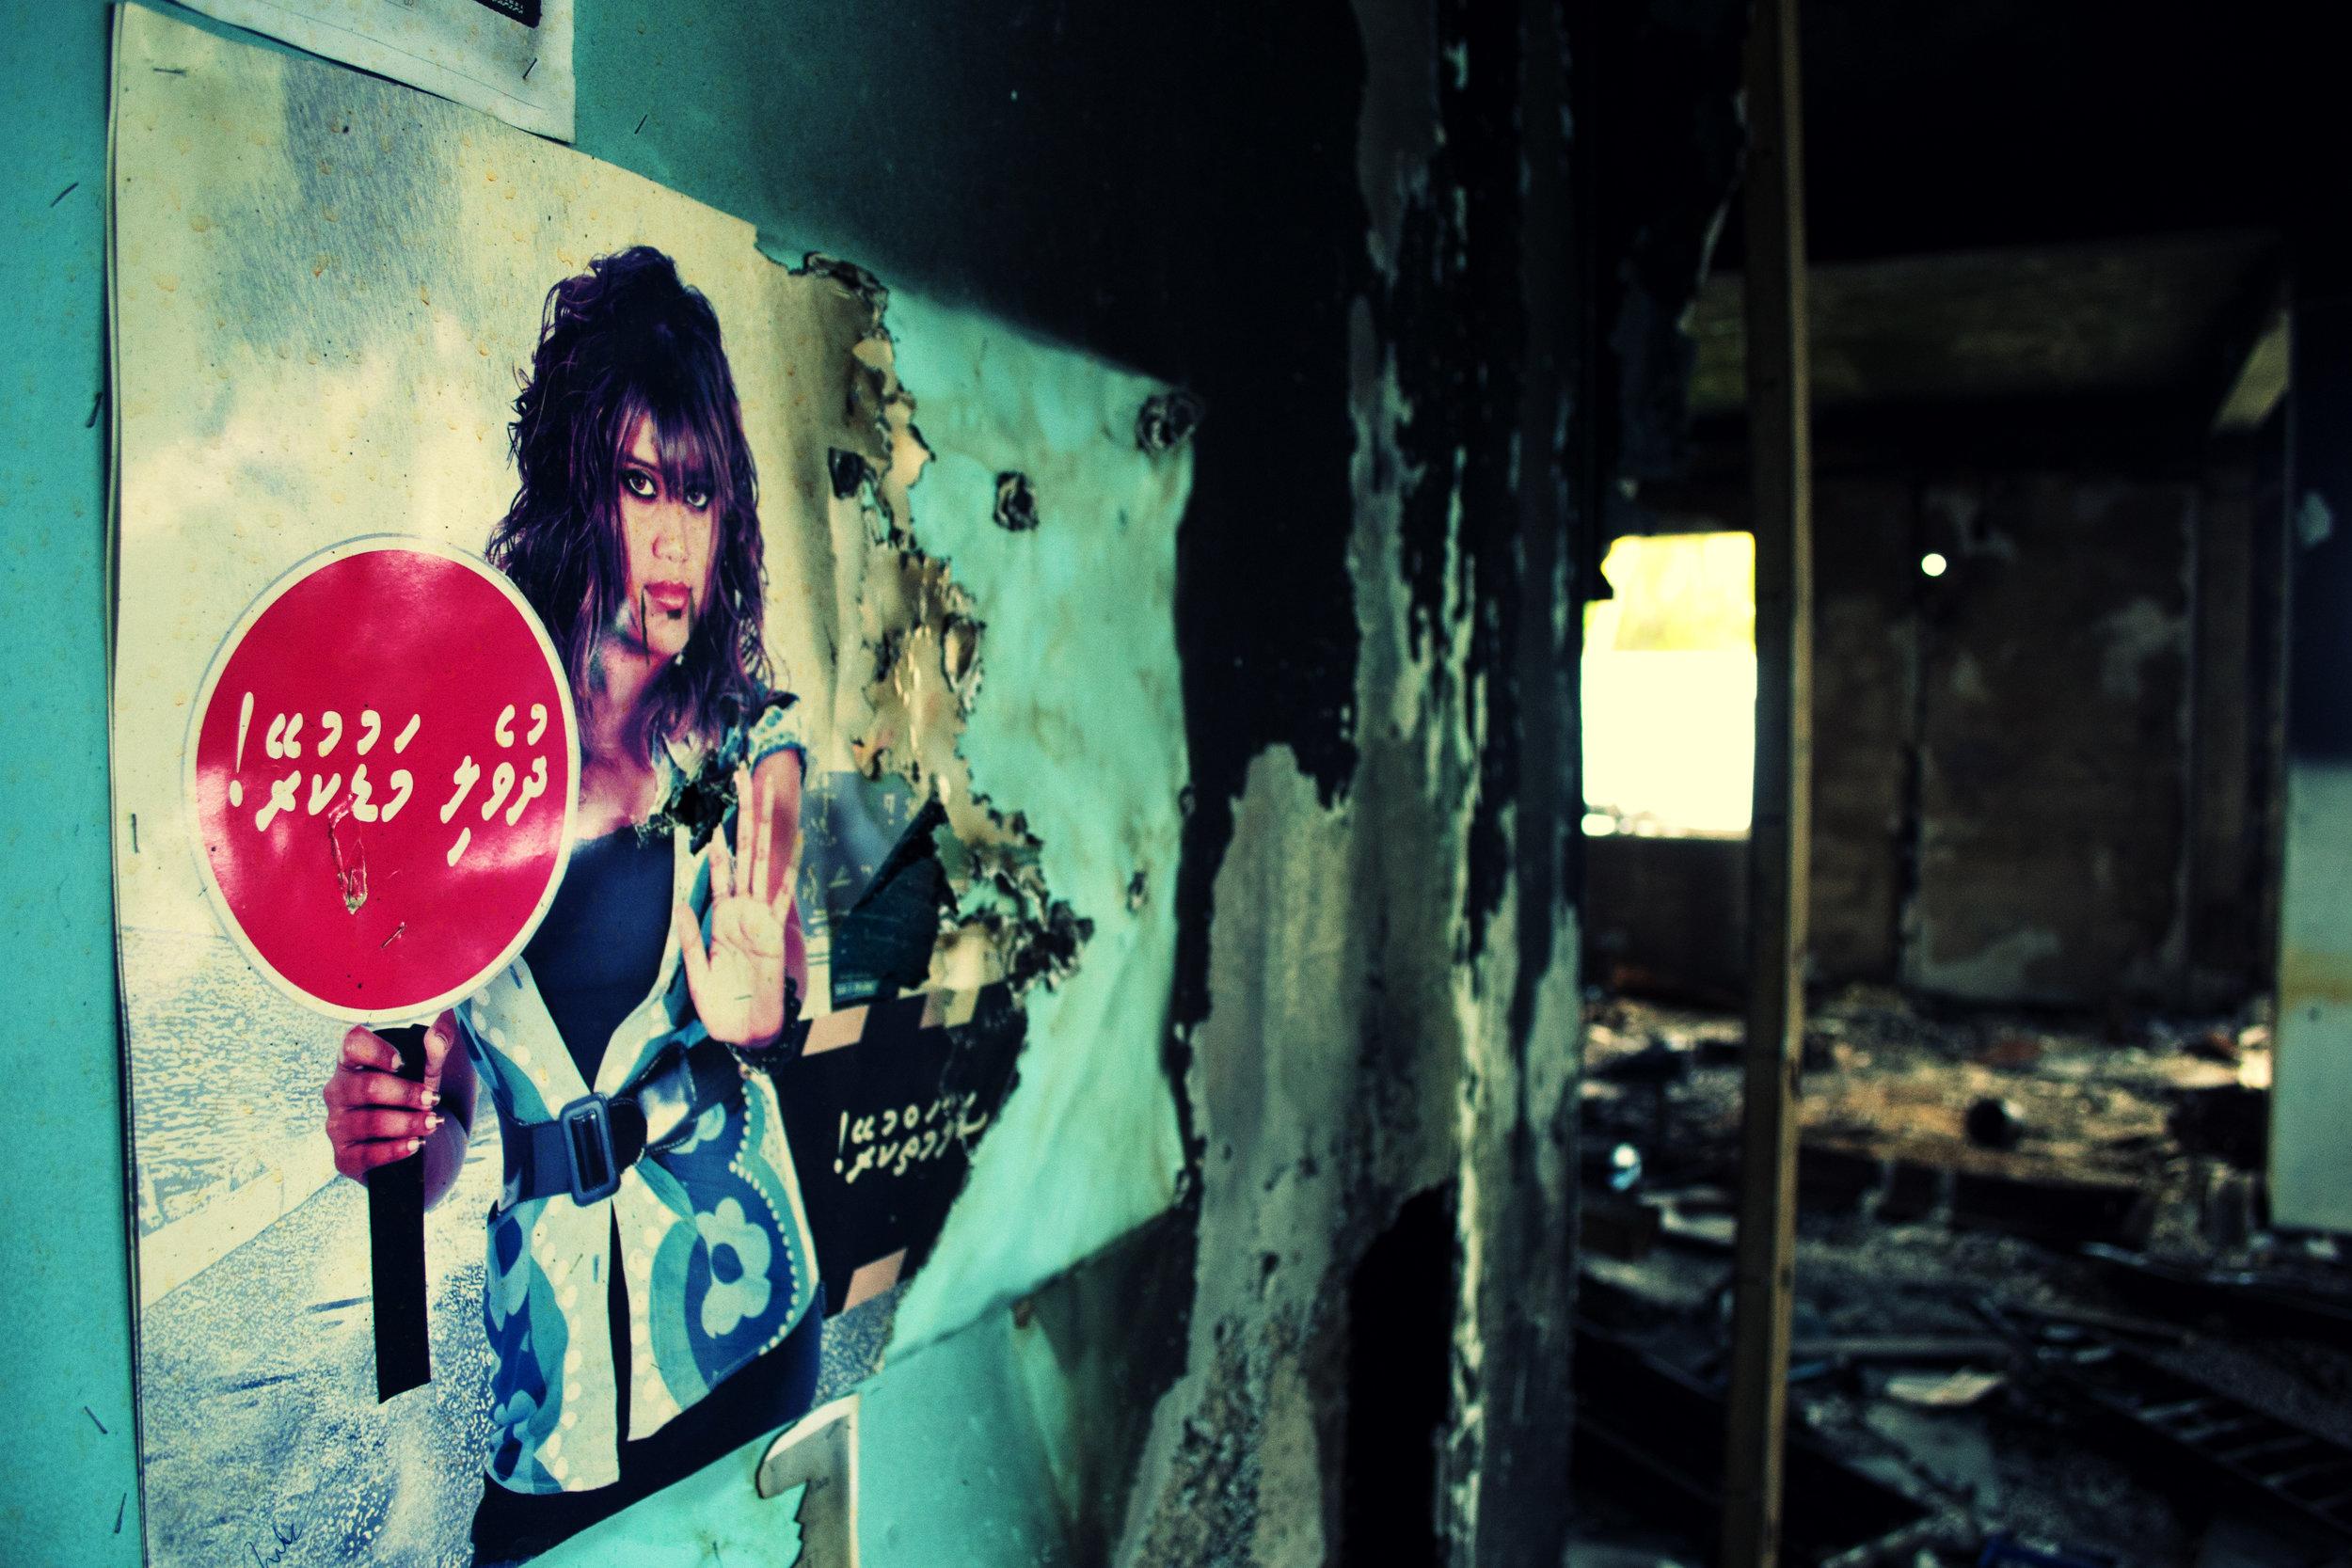 2012-12-05 - Addu Atoll - Hithadhoo - Southern Region Police Station - DSC_8830.jpg